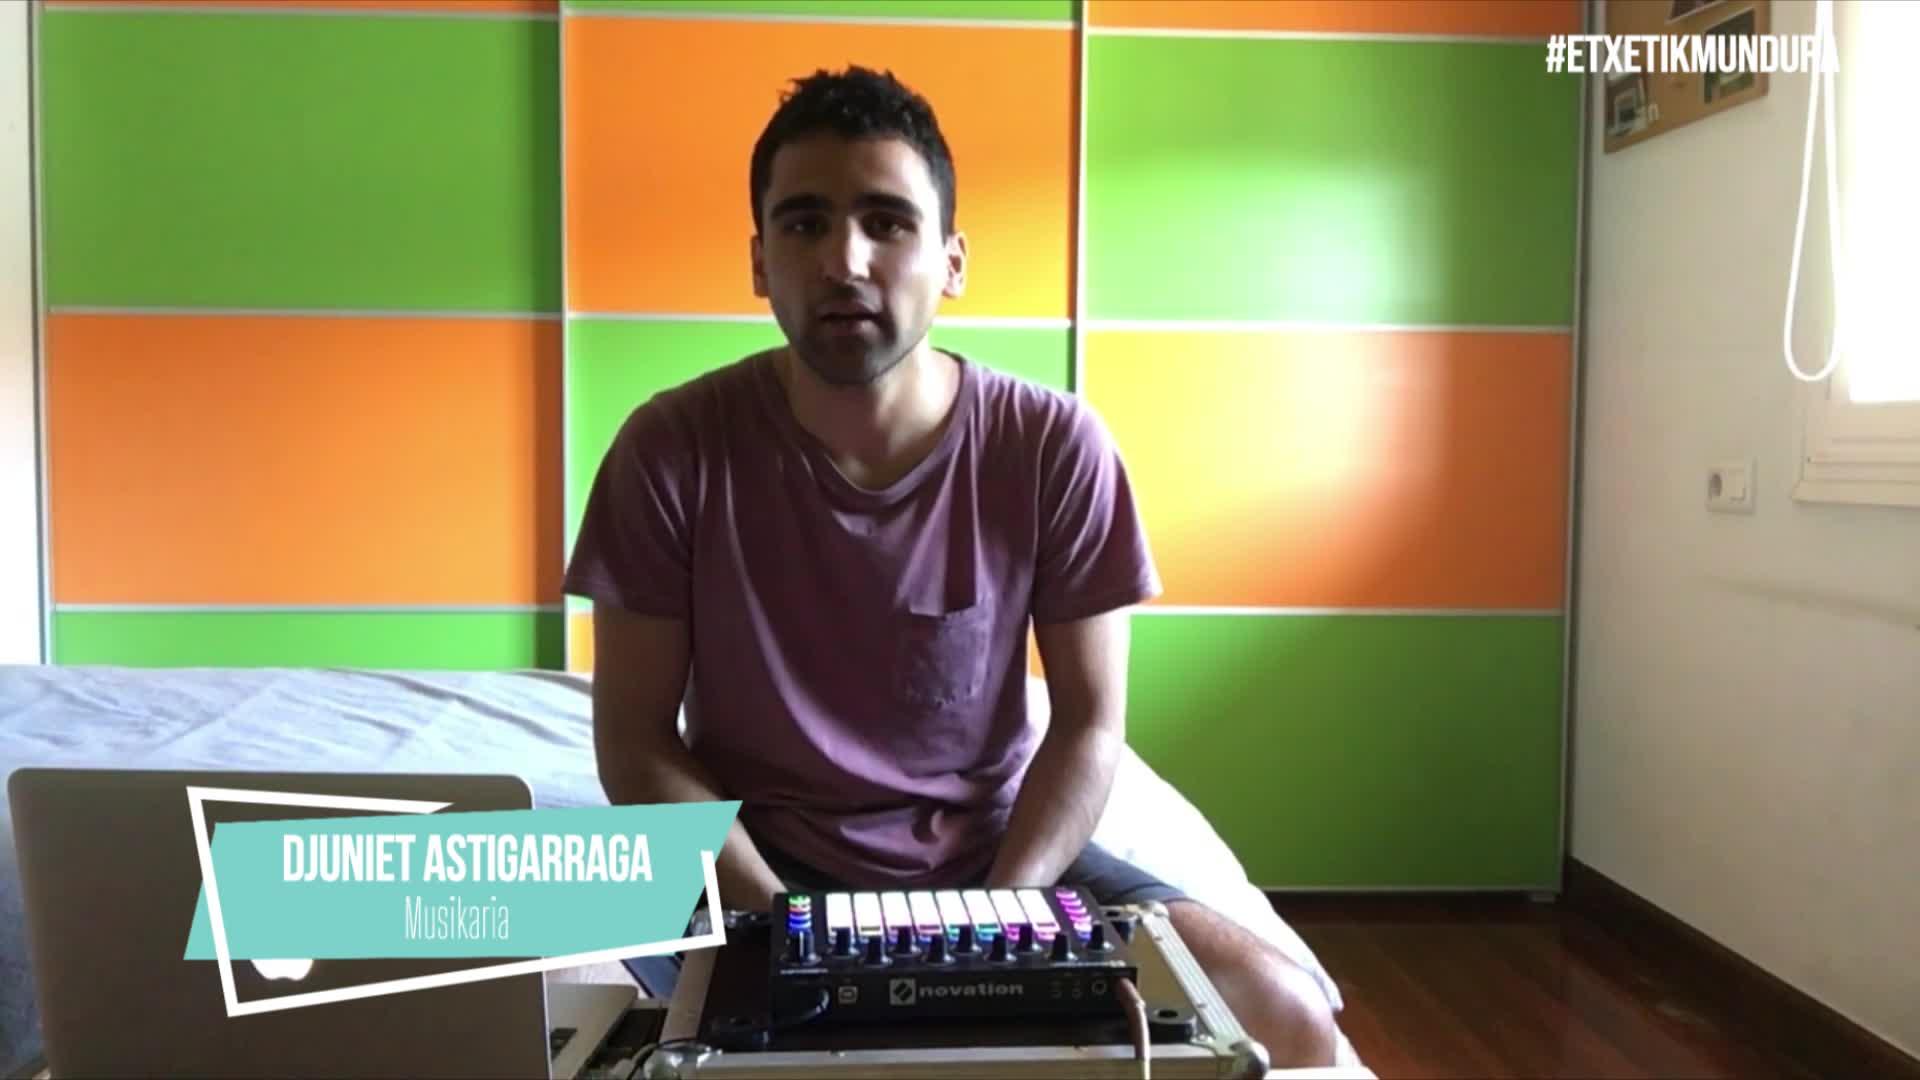 DJuniet Astigarraga musikaria, etxetik mundura